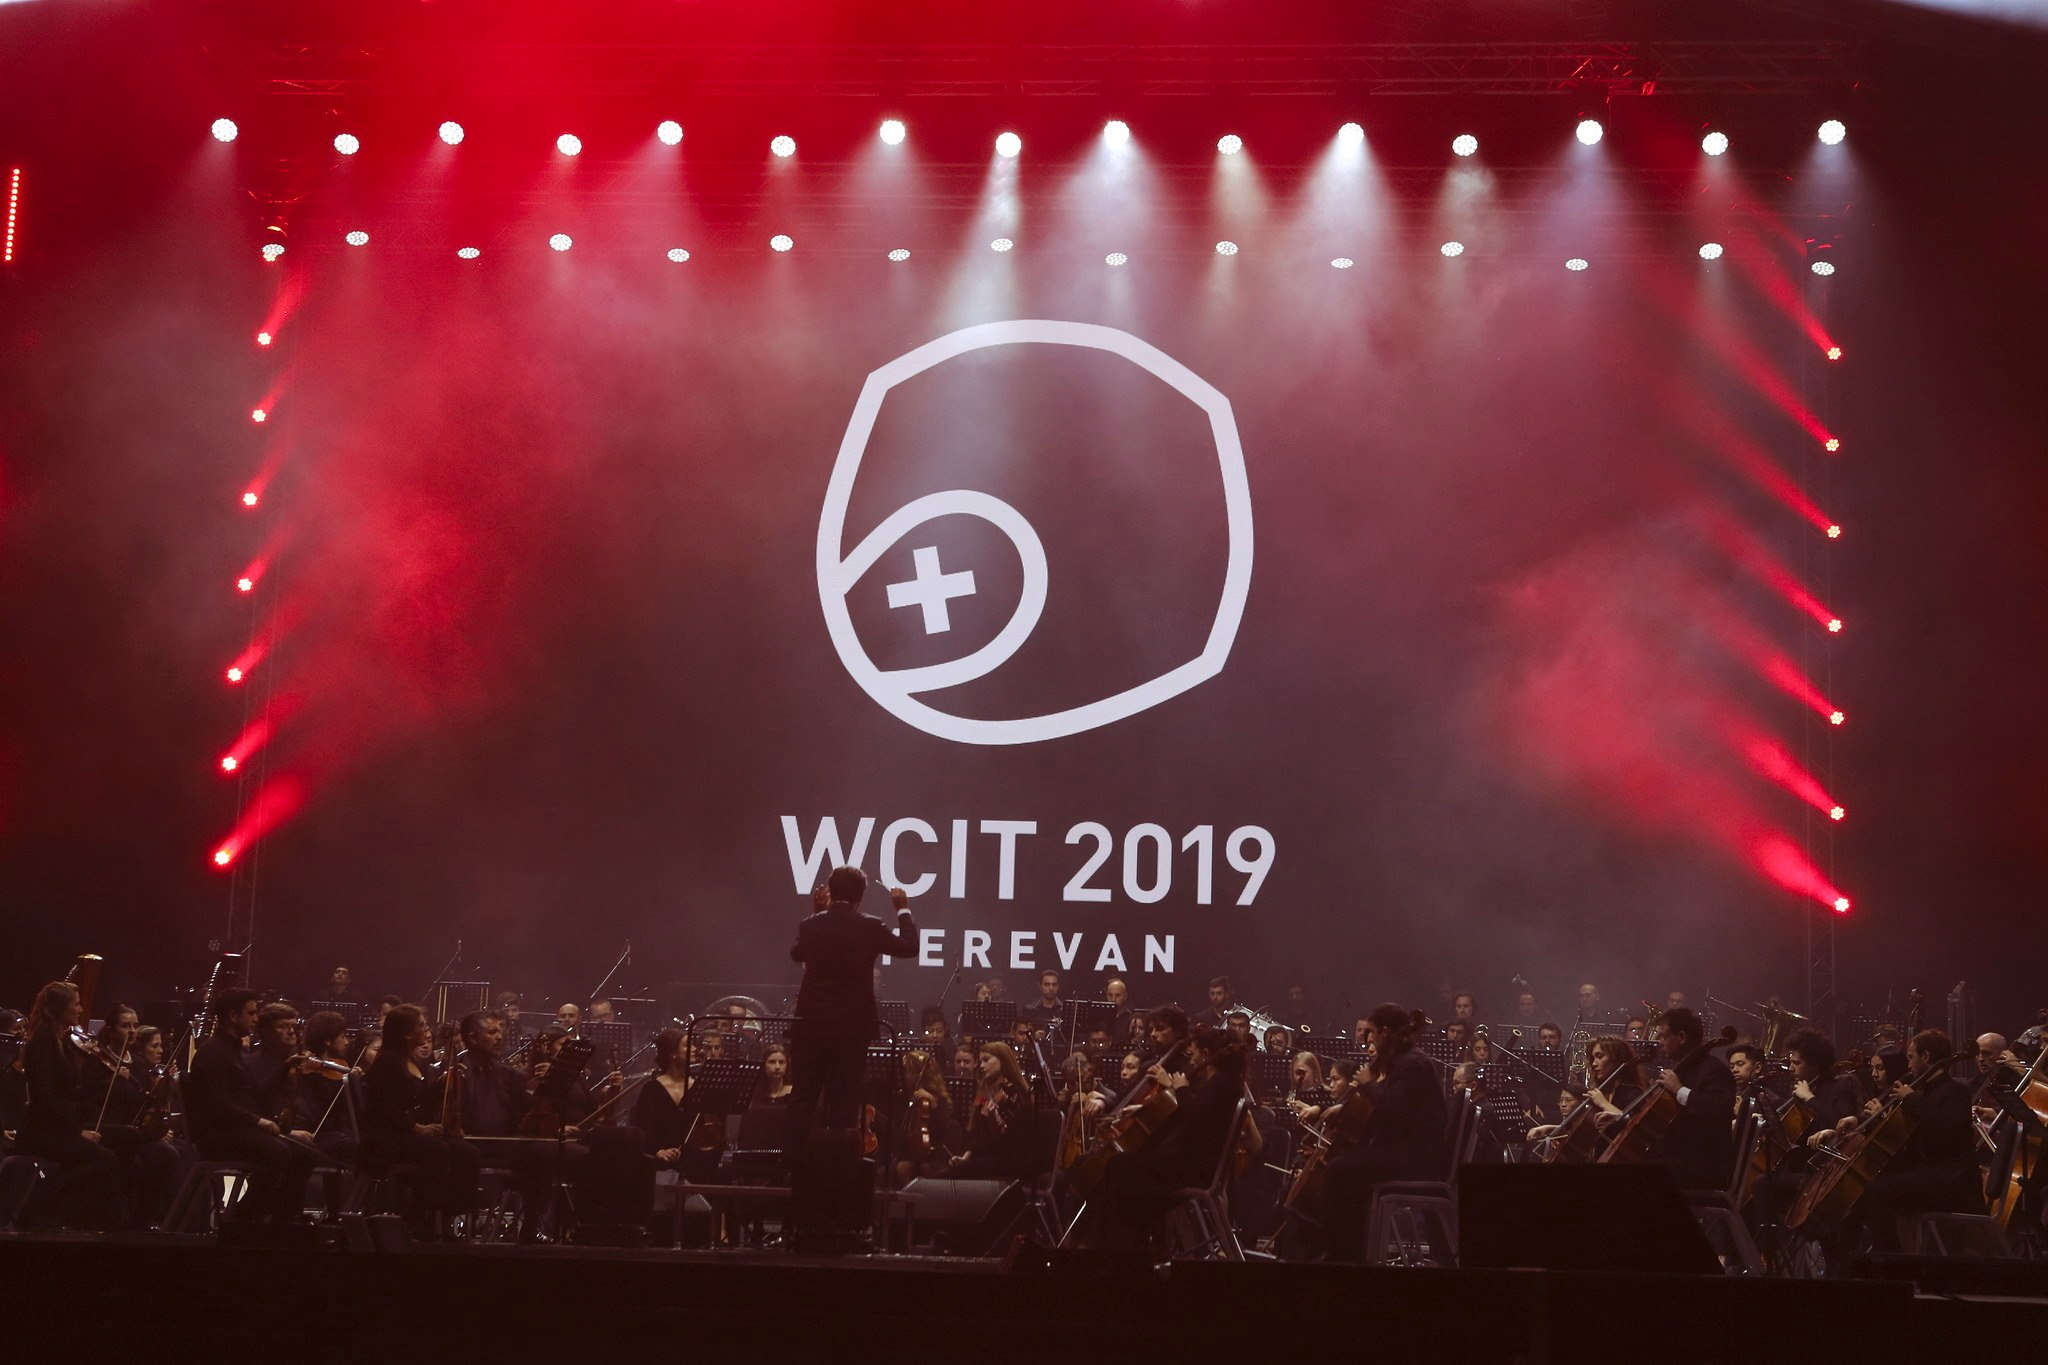 WCIT, WCIT 2019, Dünya Texnologiya Konqresi, Kim Kardaşyan, Aleksis Ohanyyan, Nikol Paşinyan